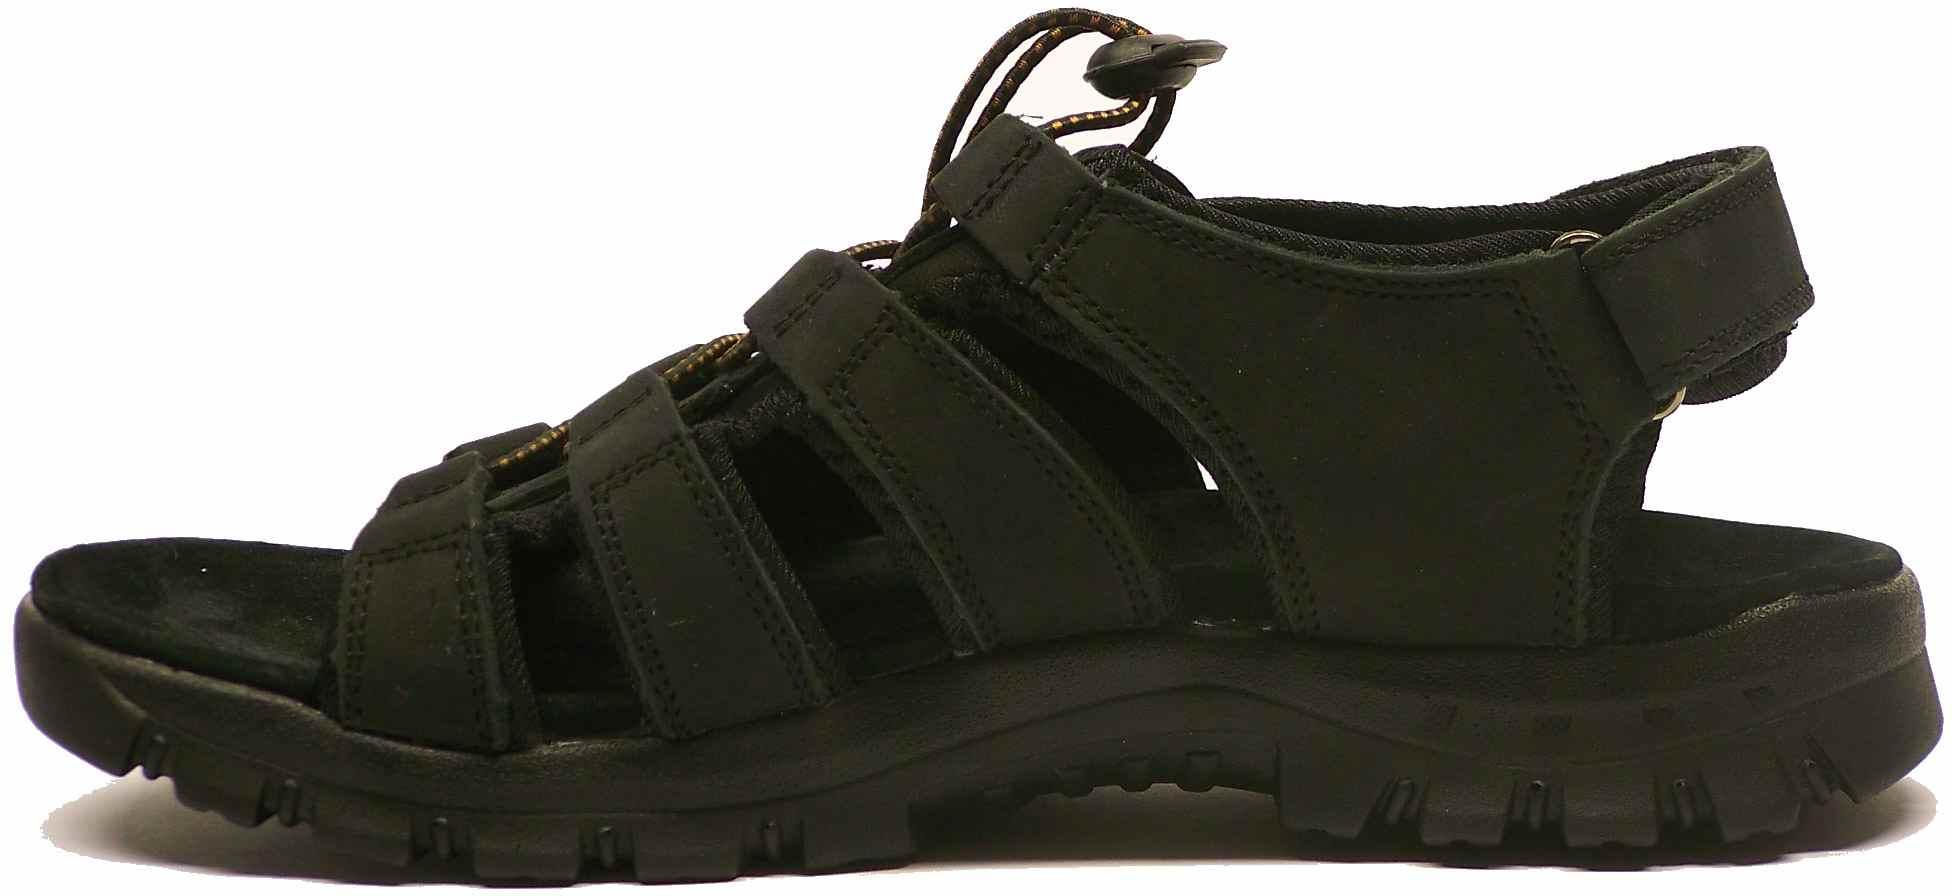 672d0f612 Numero Uno VULCAN M. Pánské trekové sandály. Pánské trekové sandály